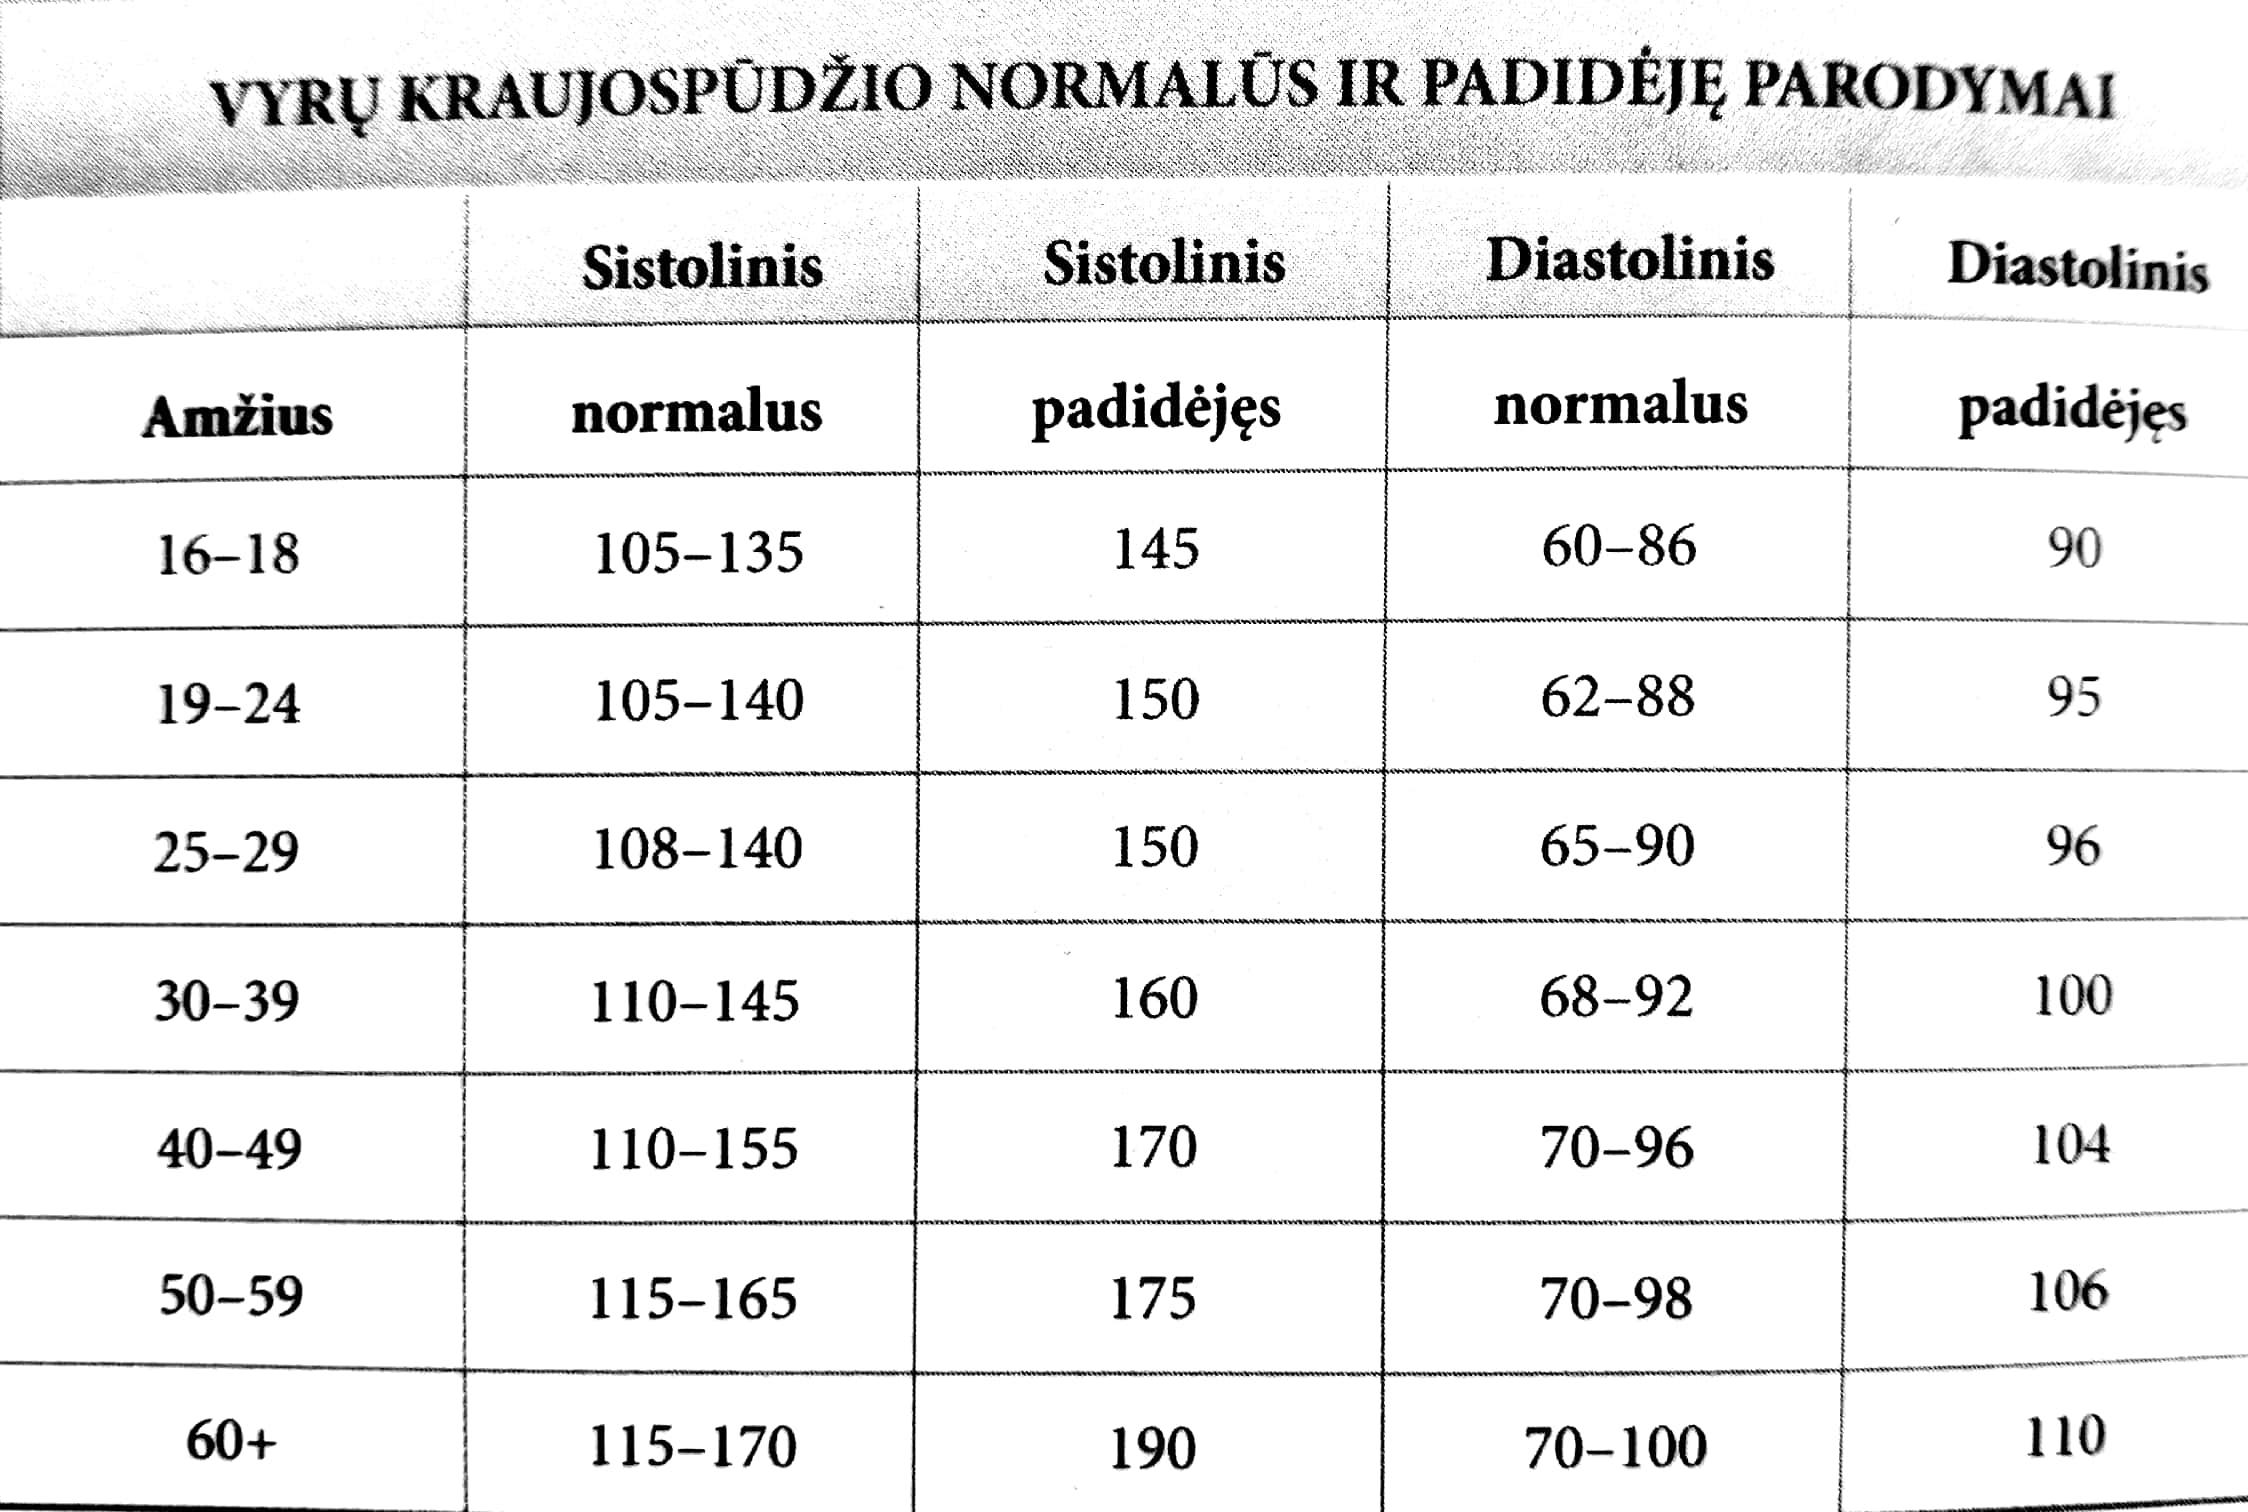 prasidedanti hipertenzija hipertenzija hipertenzijos skirtumai